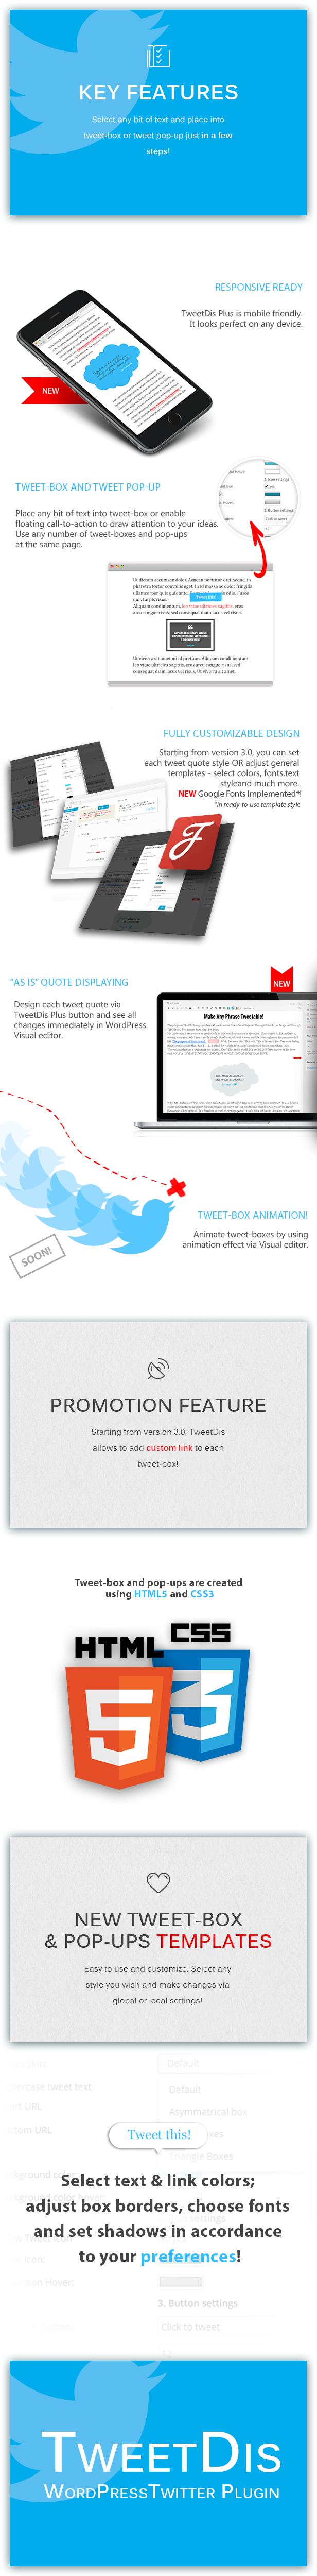 TweetDis - Make Any Phrase Tweetable - 7